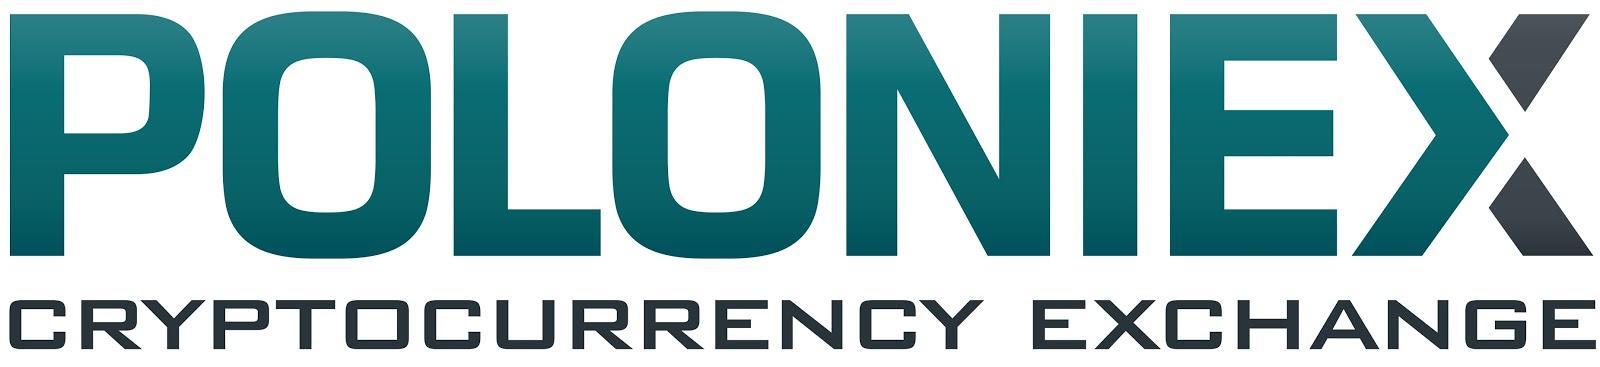 poloniex  exchange crypto-monnaies